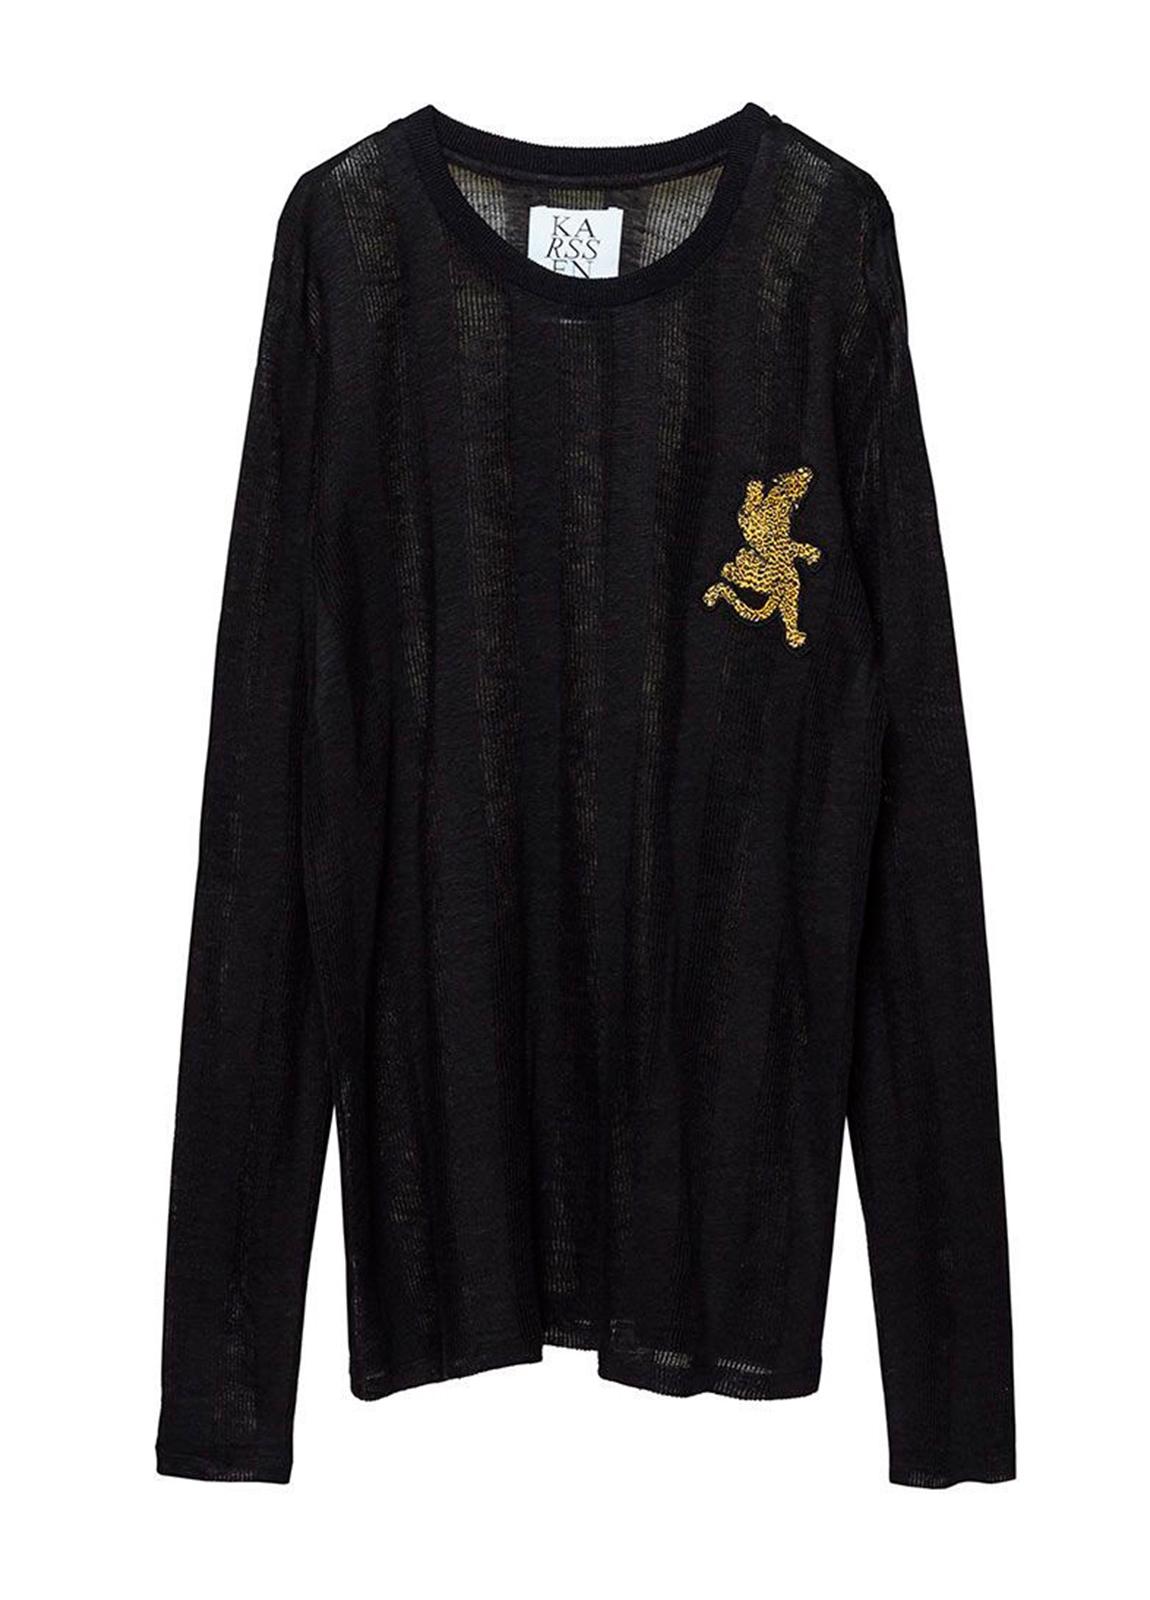 Camiseta manga larga semitransparente color negro con leopardo bordado. 100% Lino. - Ítem1